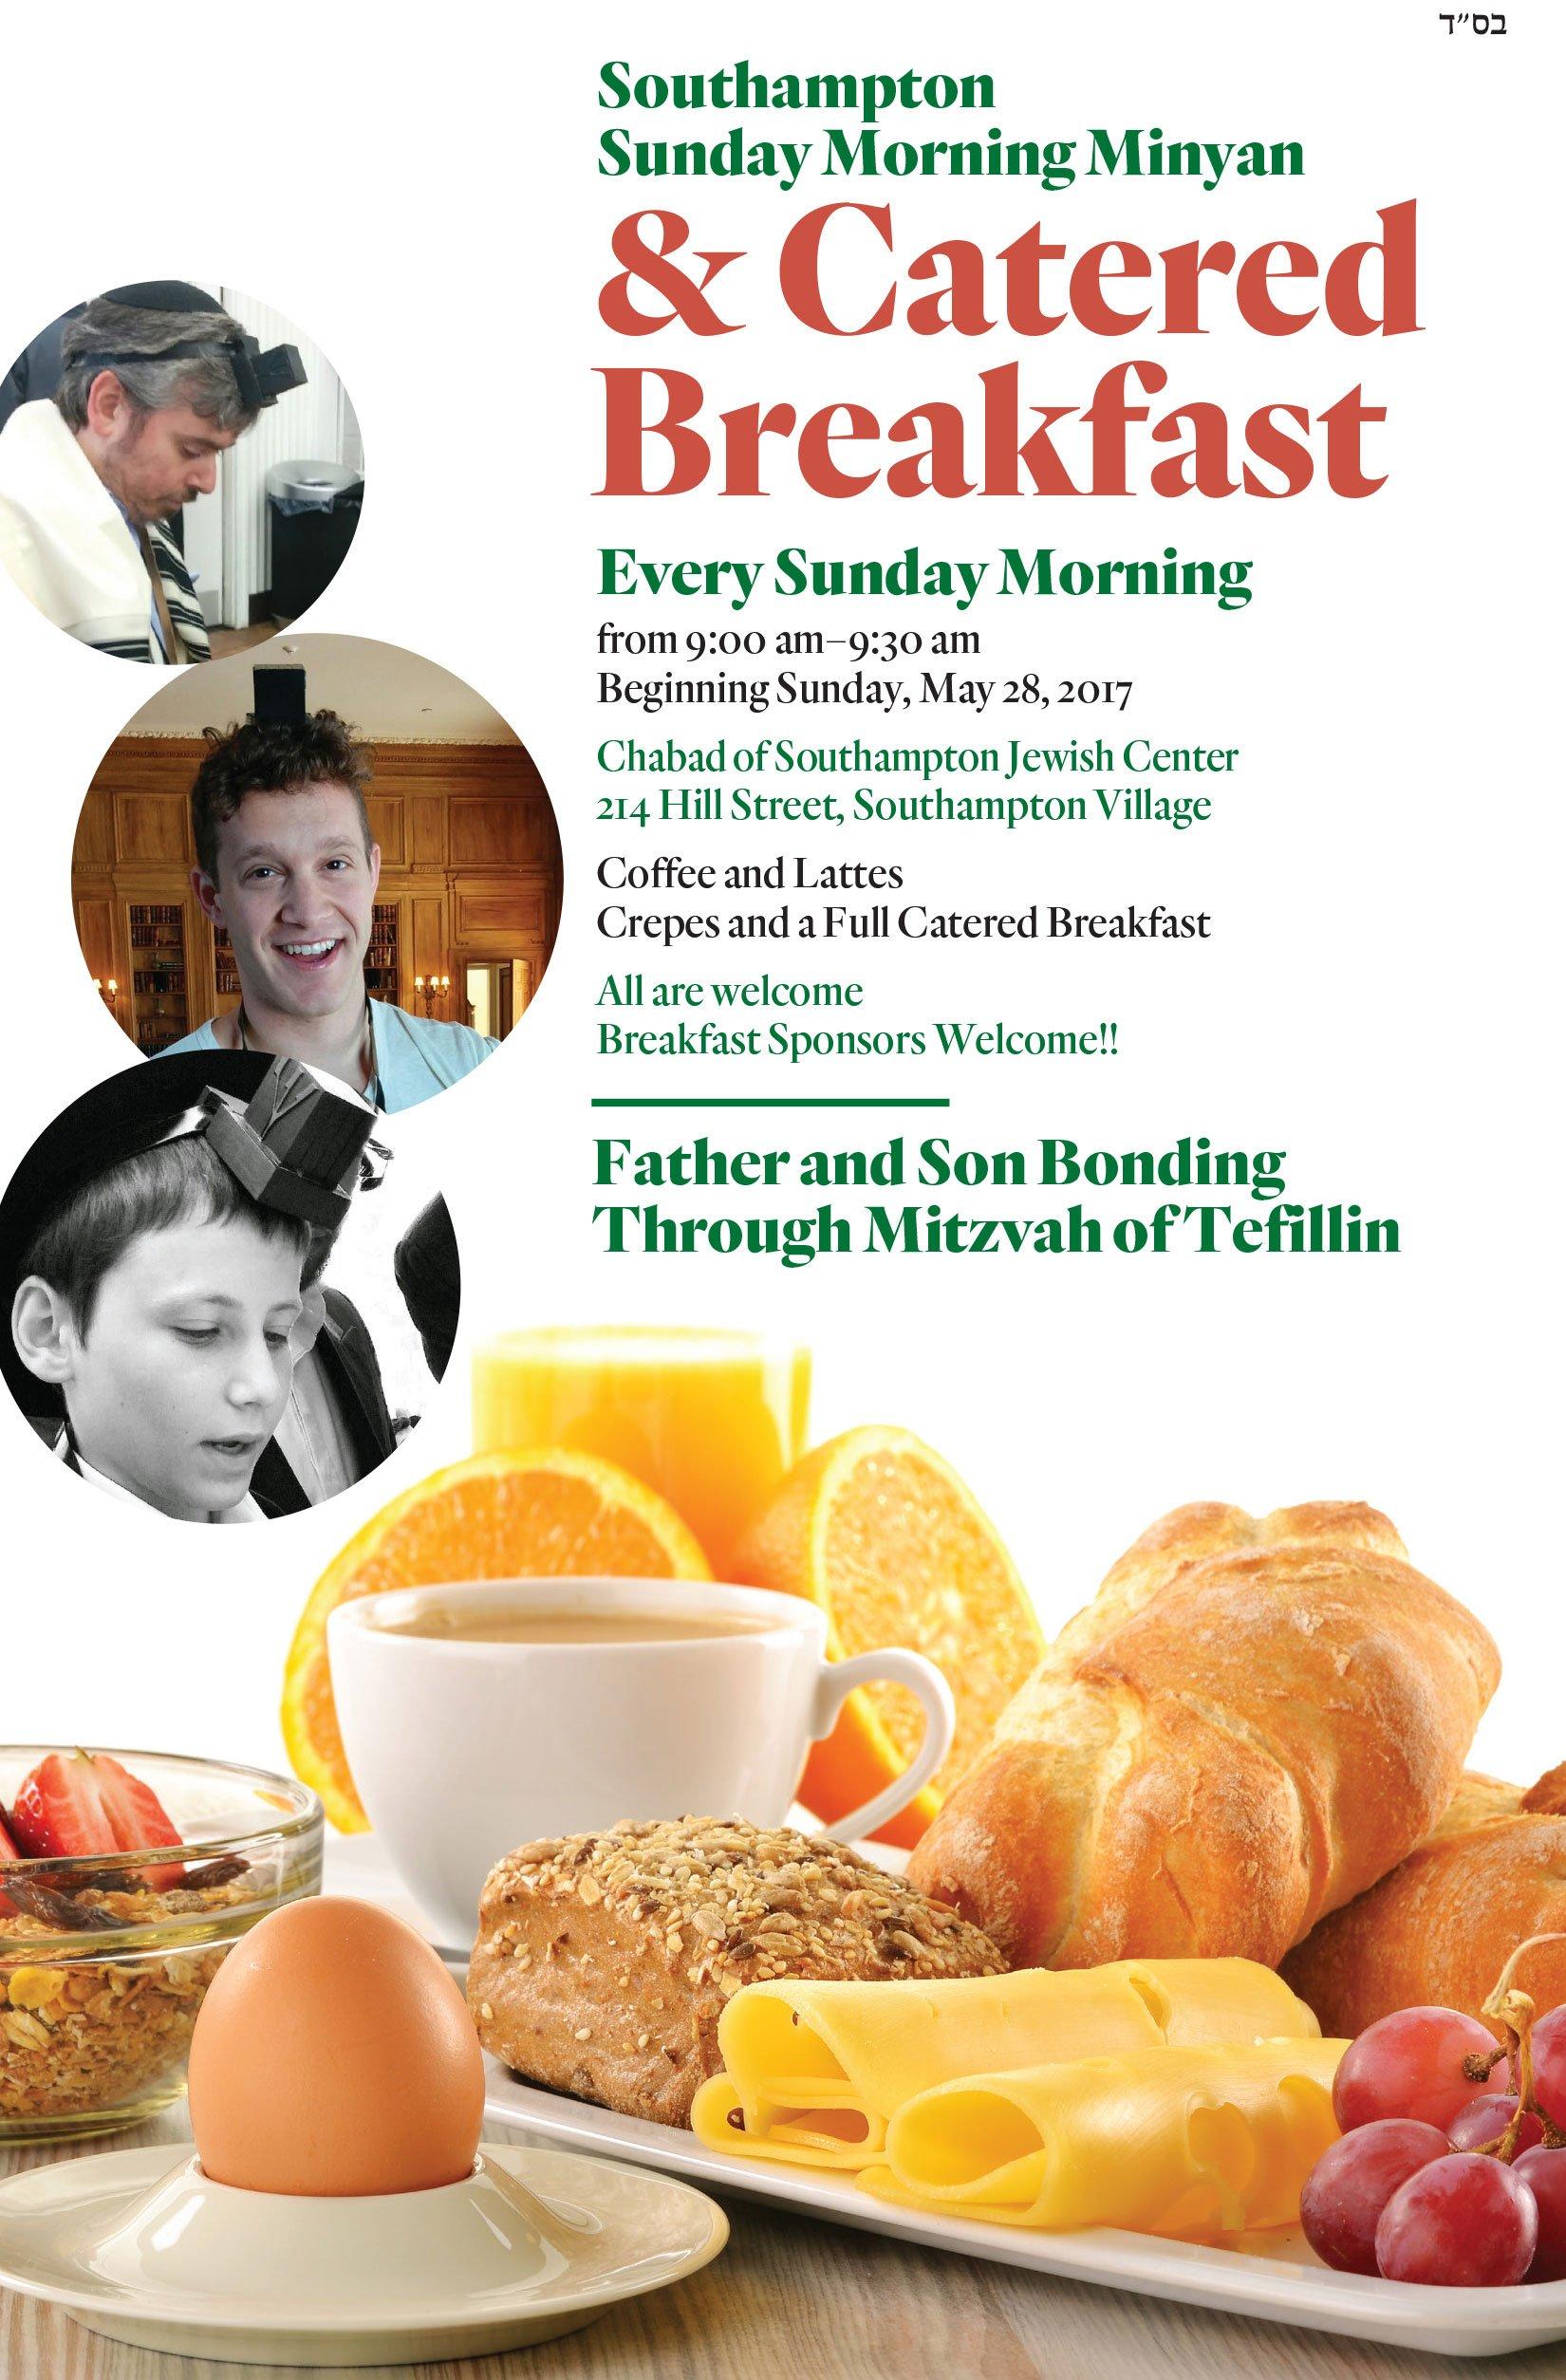 Southampton-Sunday-Breakfast-card-2017-Page1-2.jpg